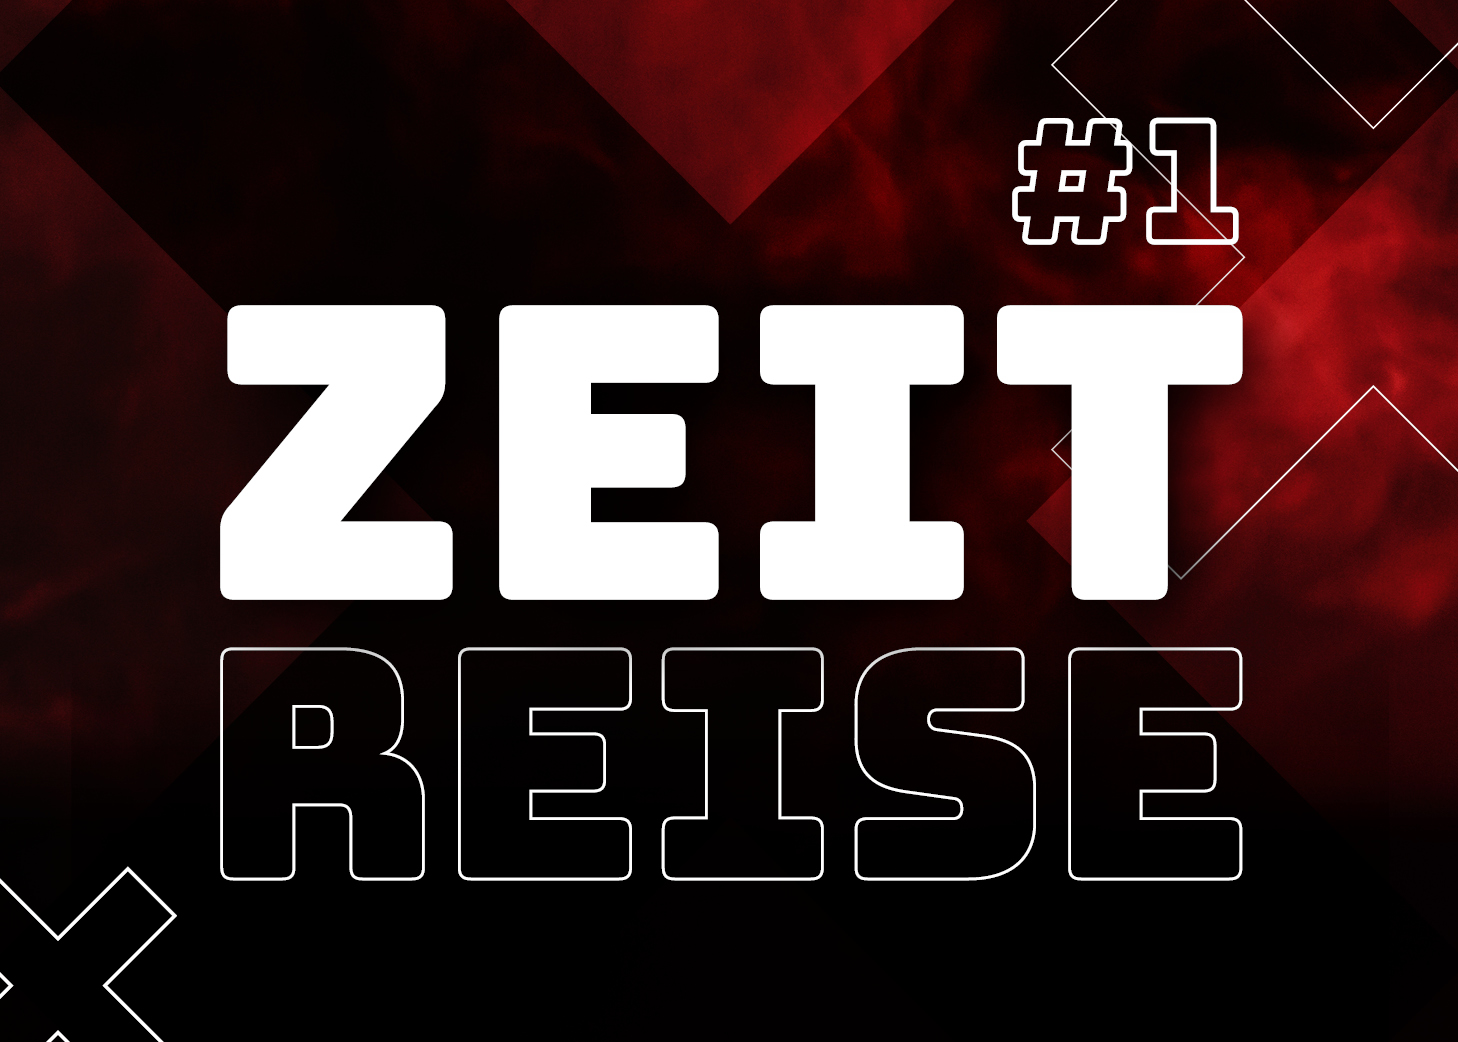 TSV ZEITreise